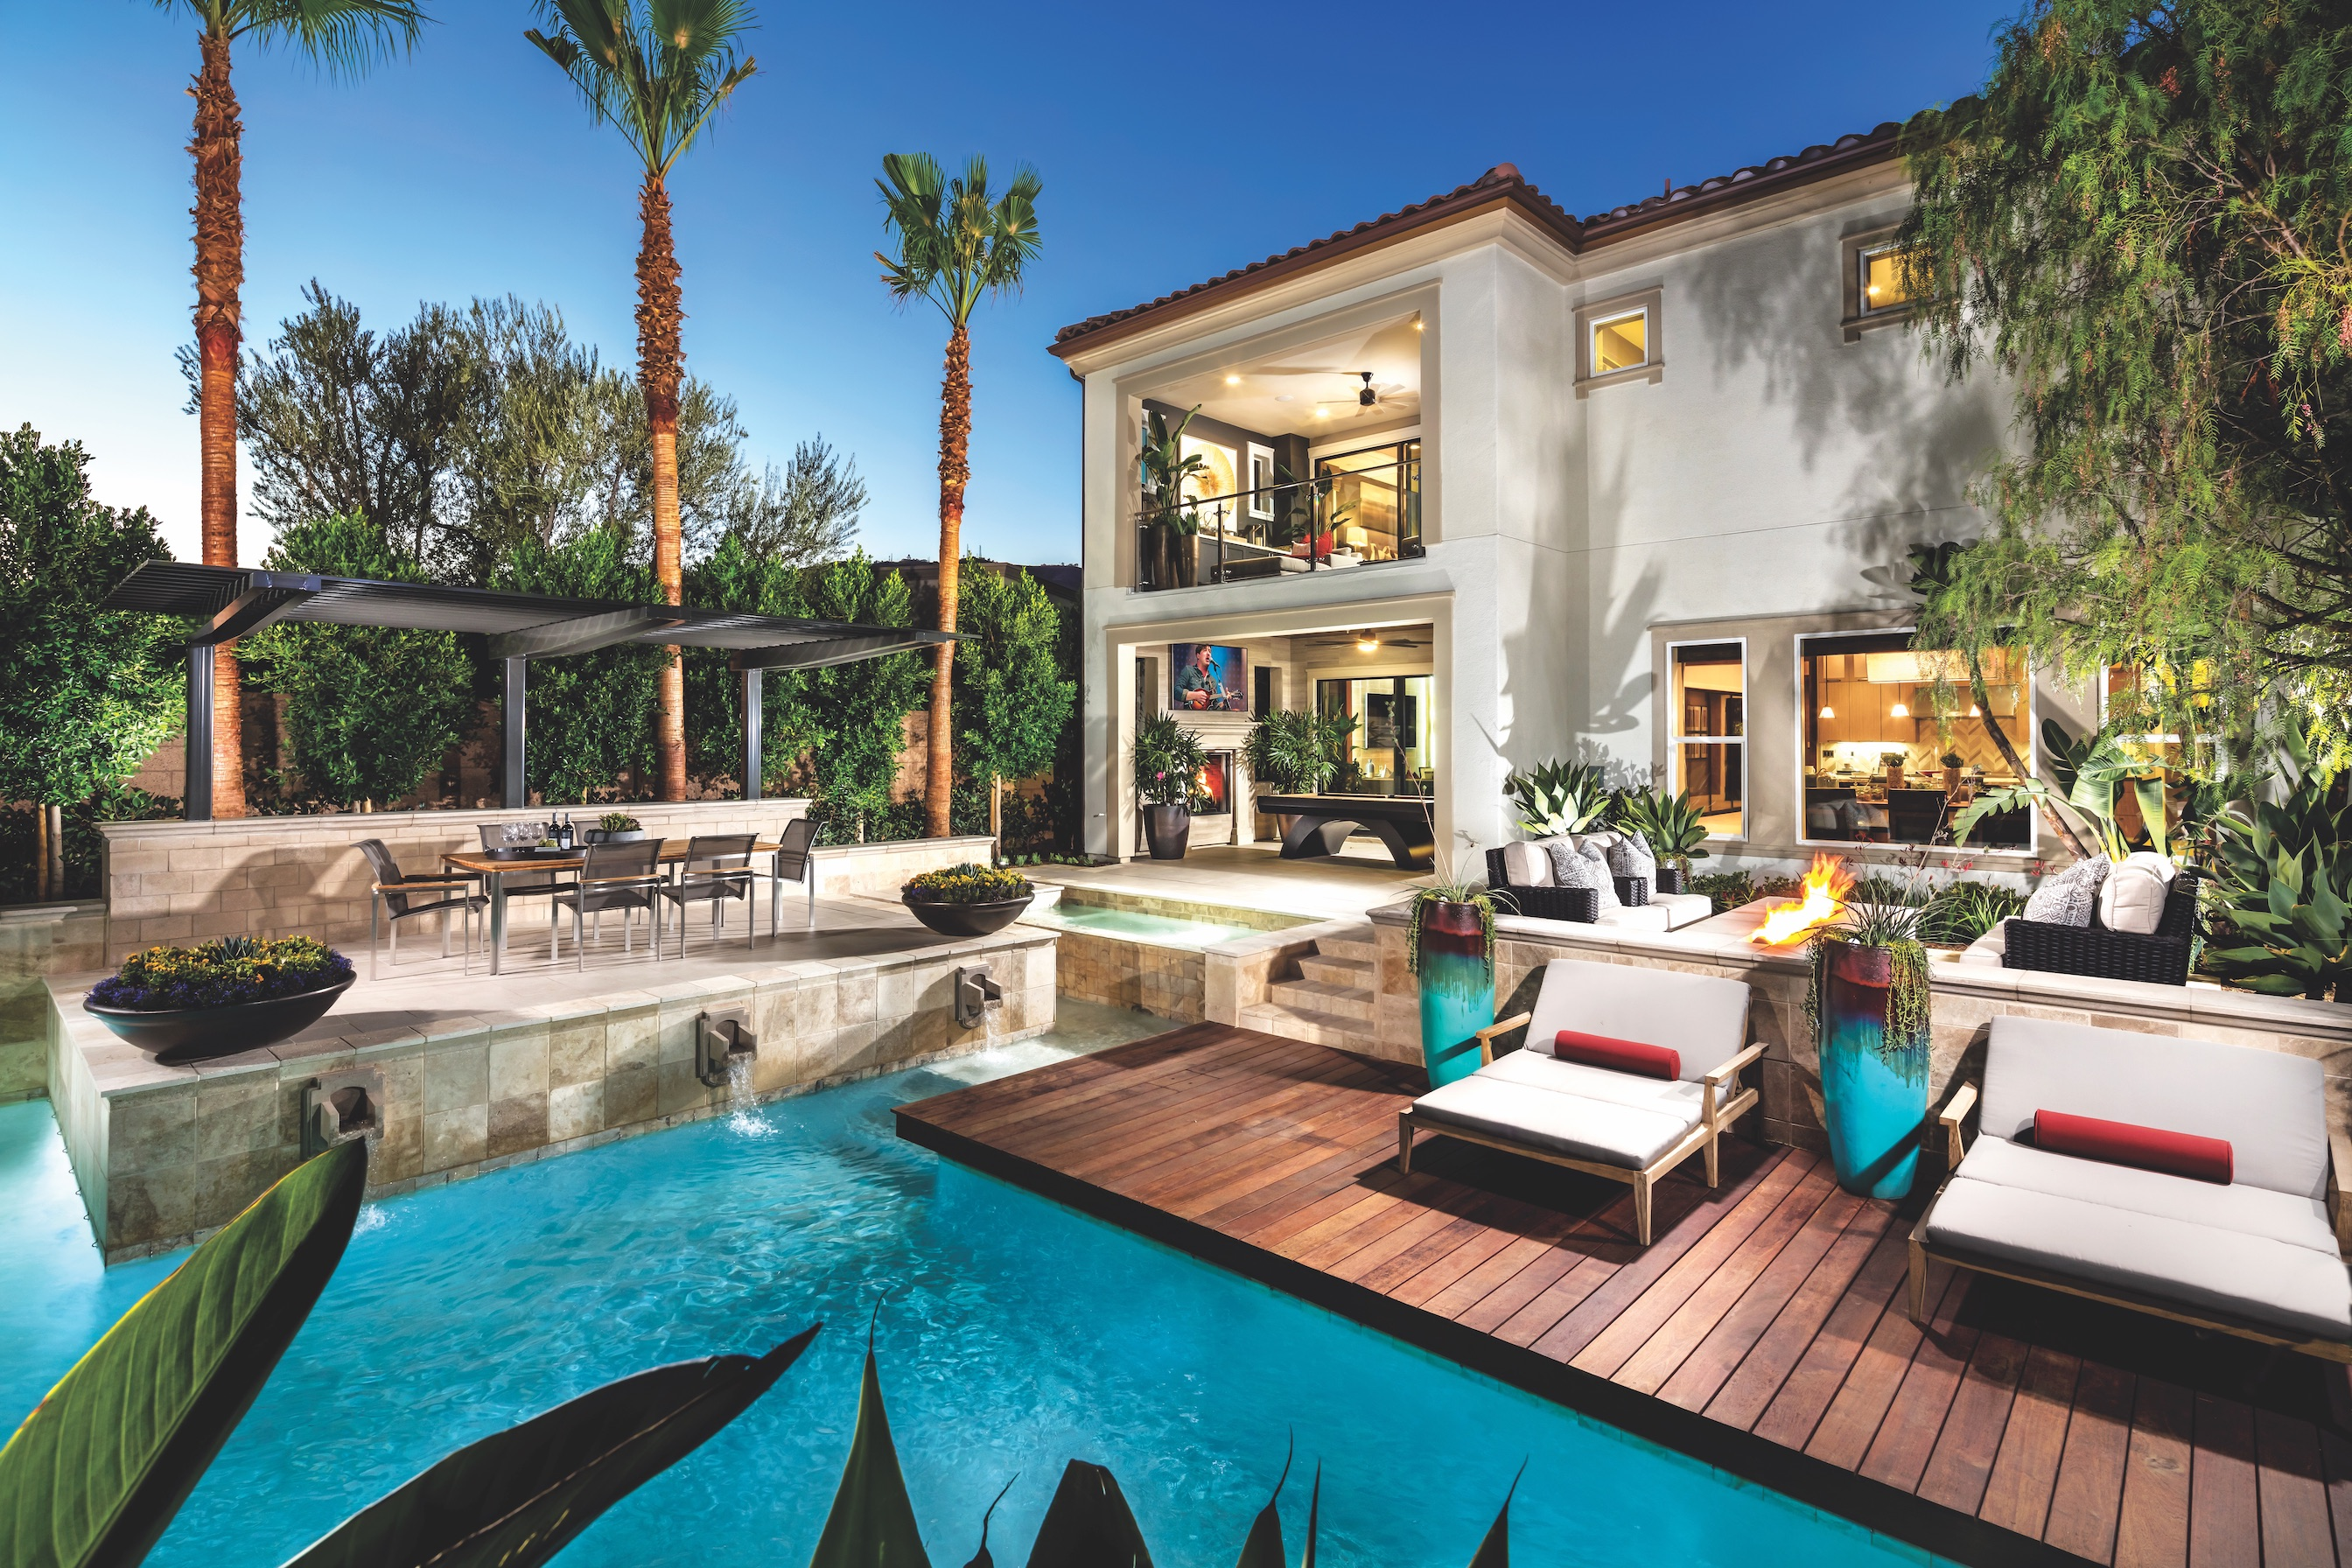 Small Backyard Landscaping Designs & Ideas | Build Beautiful on Luxury Backyard Design  id=68595